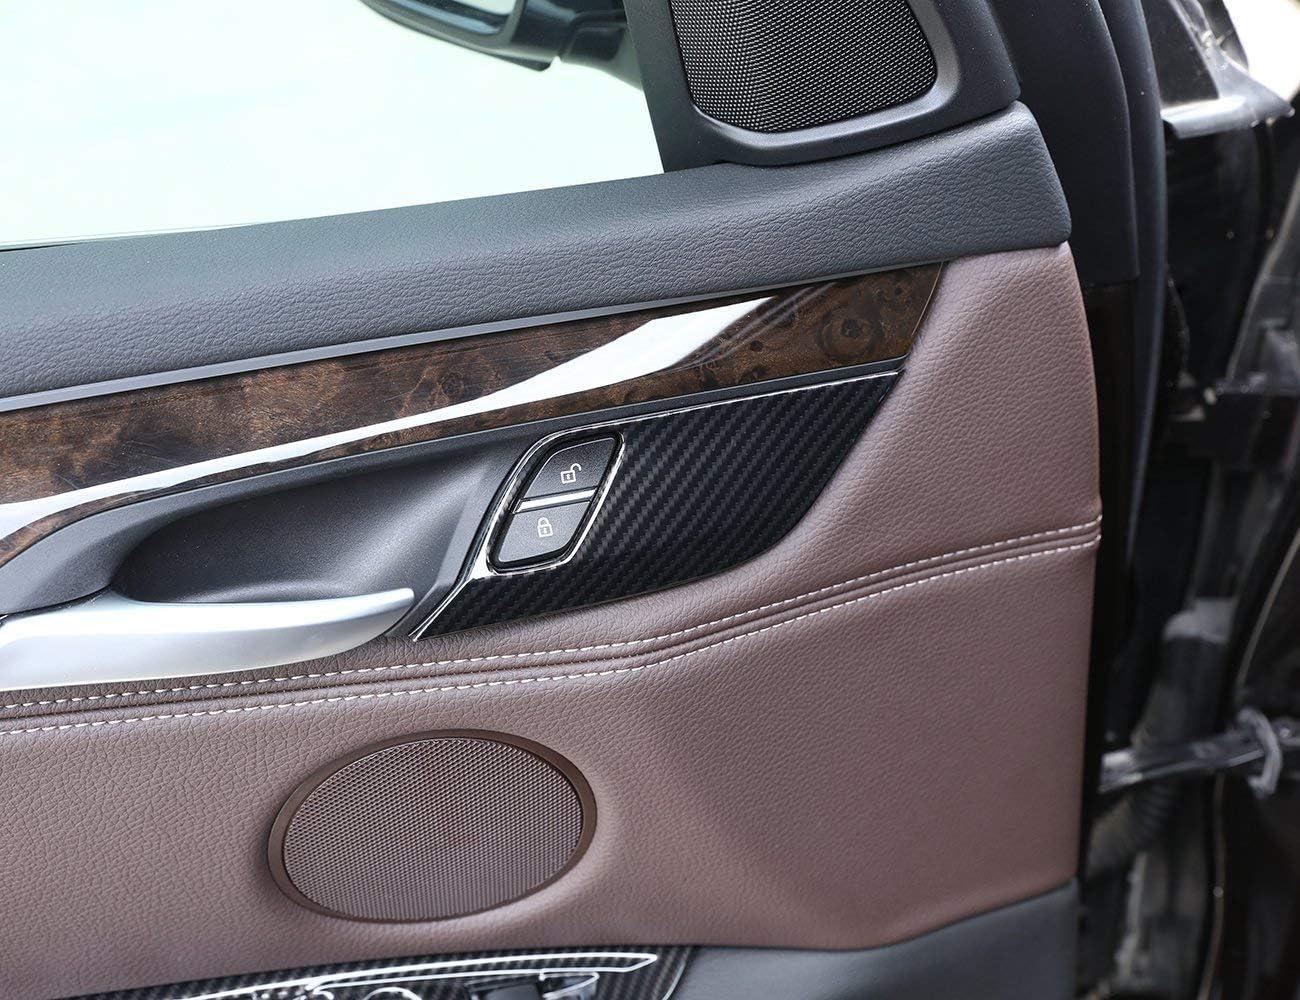 Carbon Fiber Safety Door Lock Cover Sequin Trim For BMW X5 F15 X6 F16 2014-2018